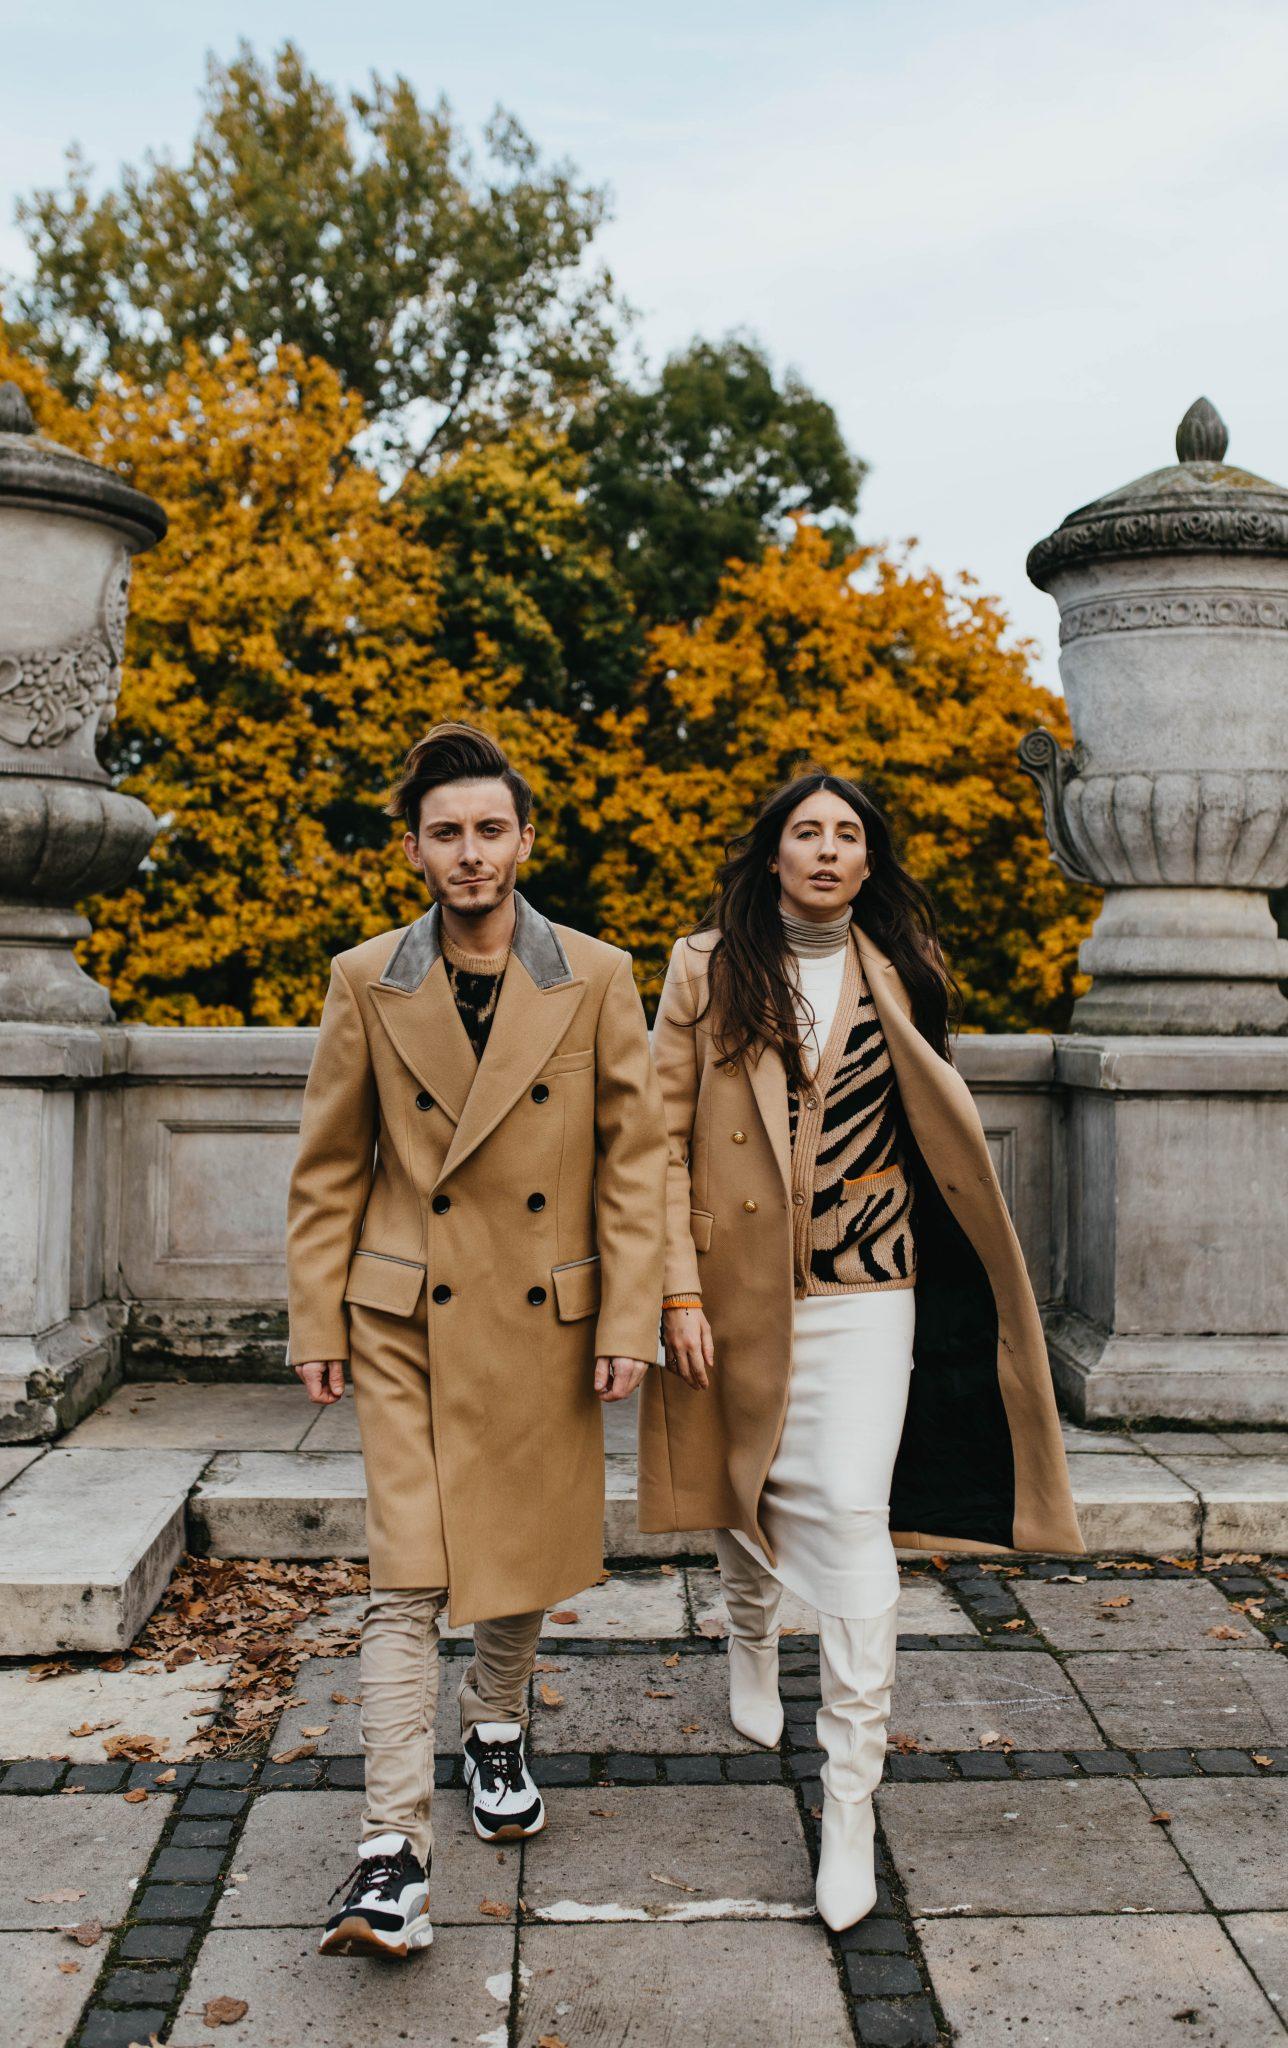 blogerzy-modowi-fashion-blogger-style-tr